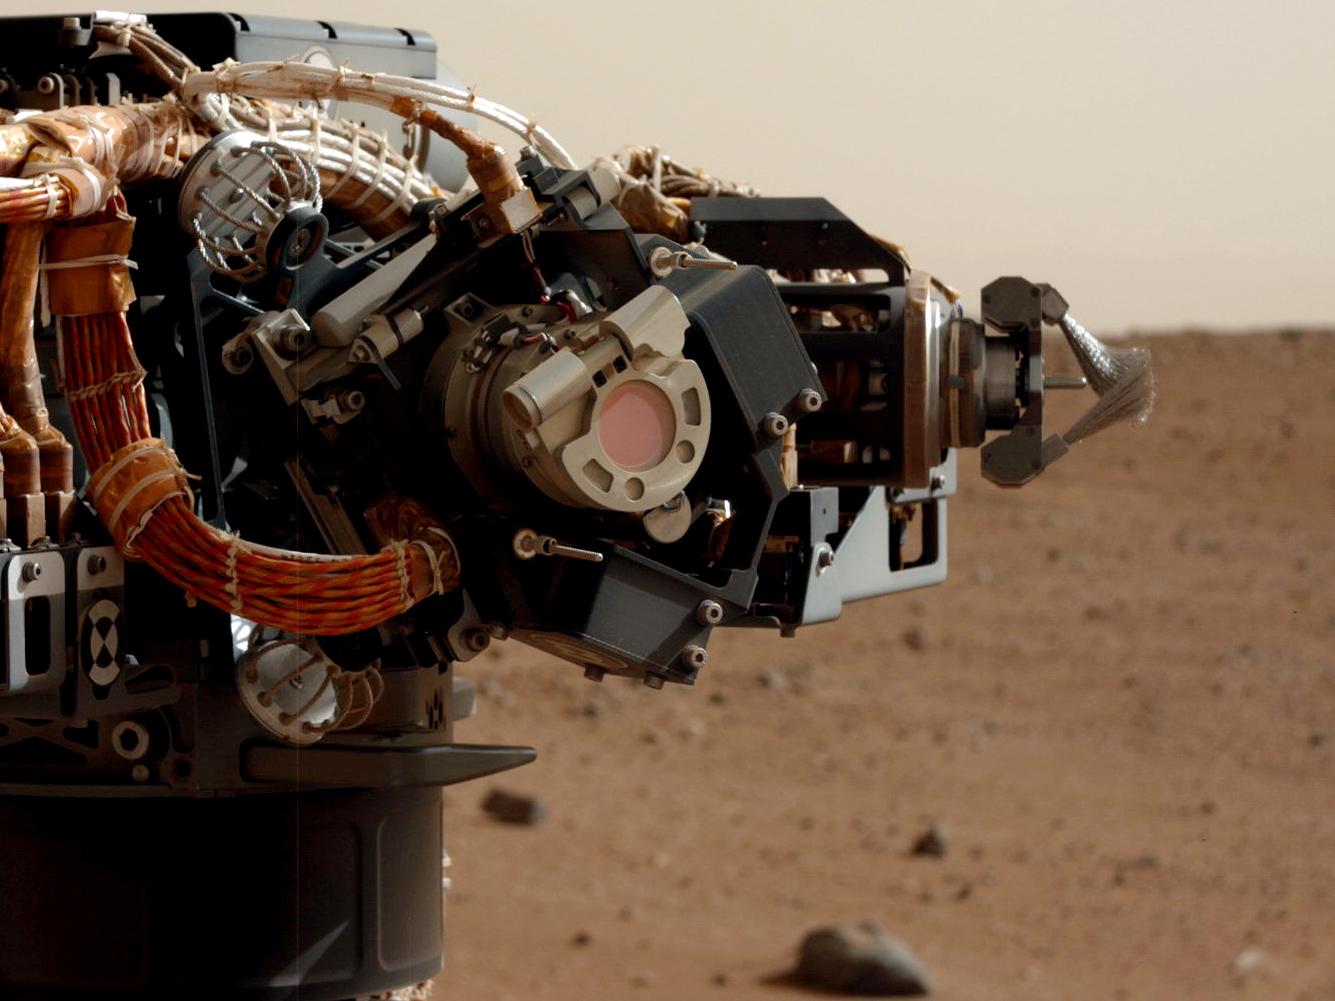 Mars Rover Curiosity's Arm Up Close